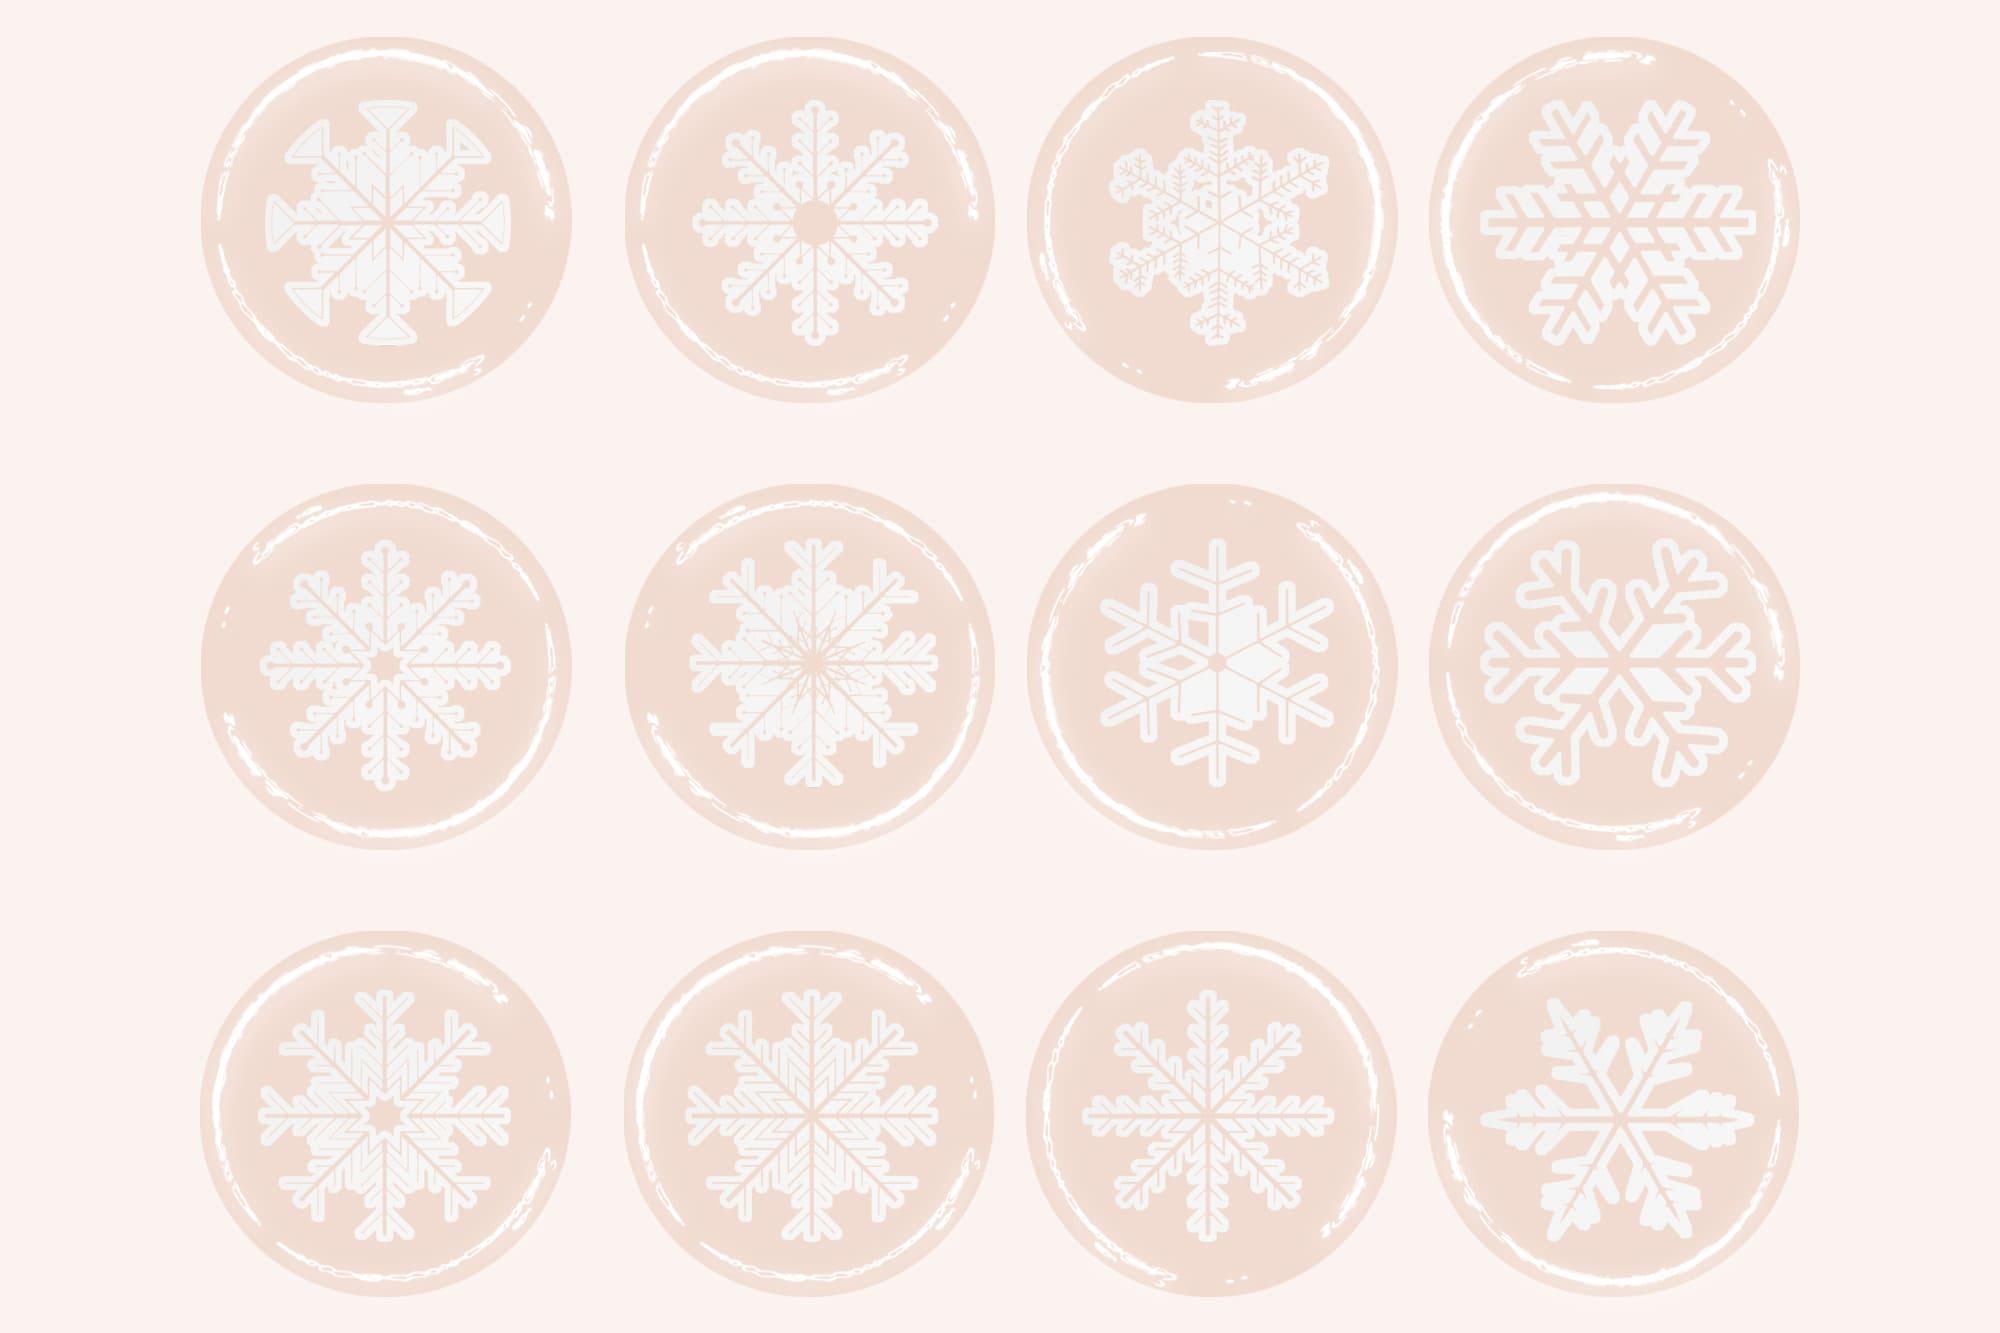 496 Christmas Illustrations: Christmas Vectors Bundle SVG, EPS, AI - Snowflakes 3c